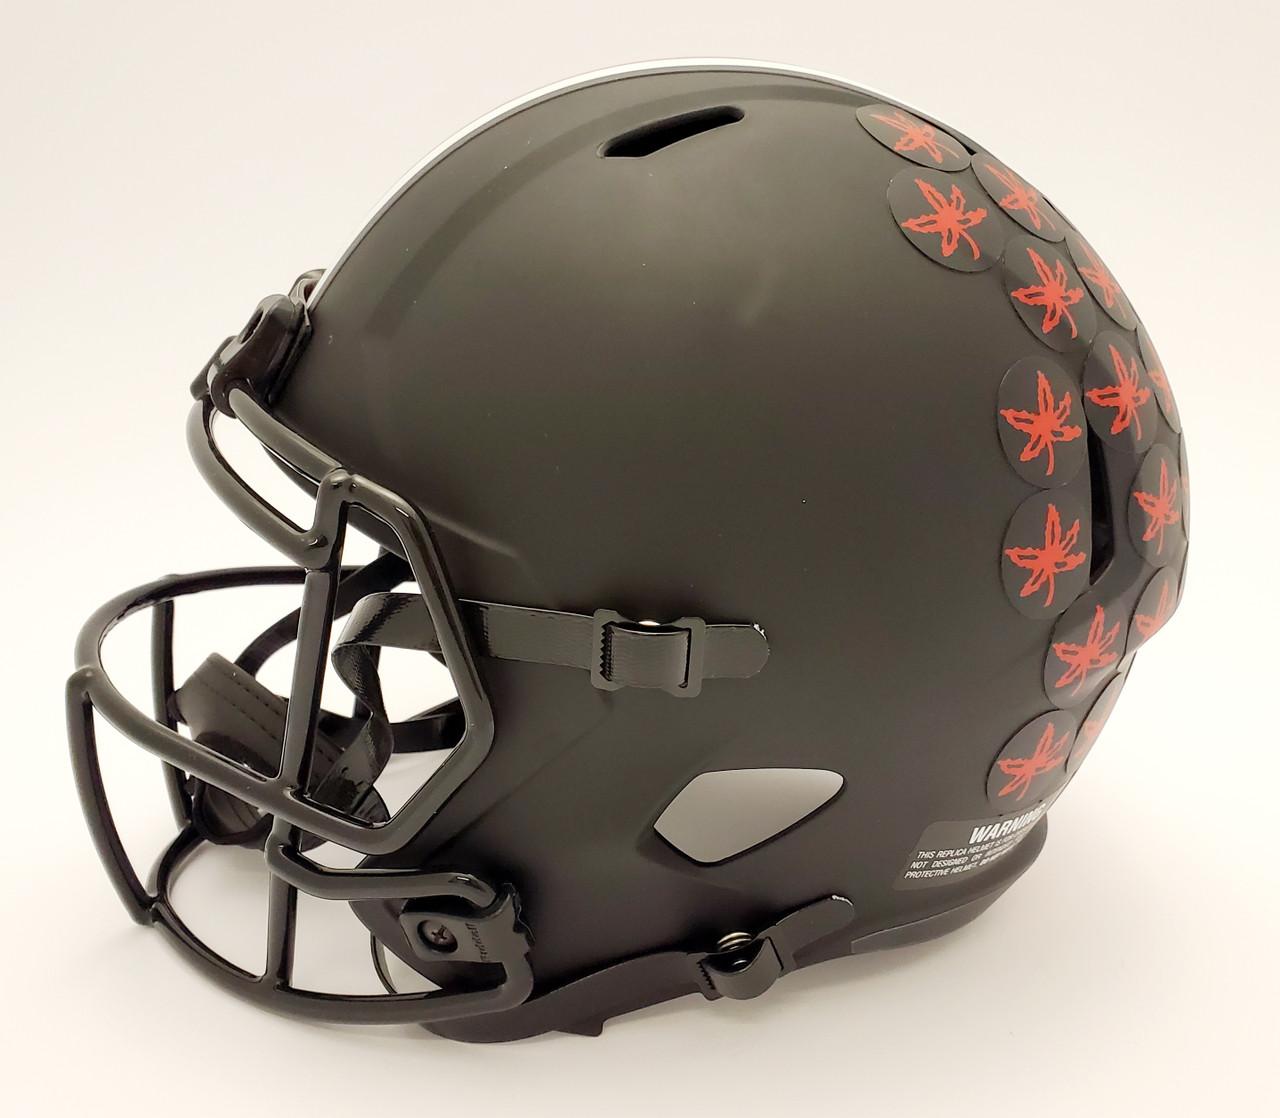 JK Dobbins Ohio State Buckeyes Autographed Black Replica Helmet (White Pen) - JSA Authentic